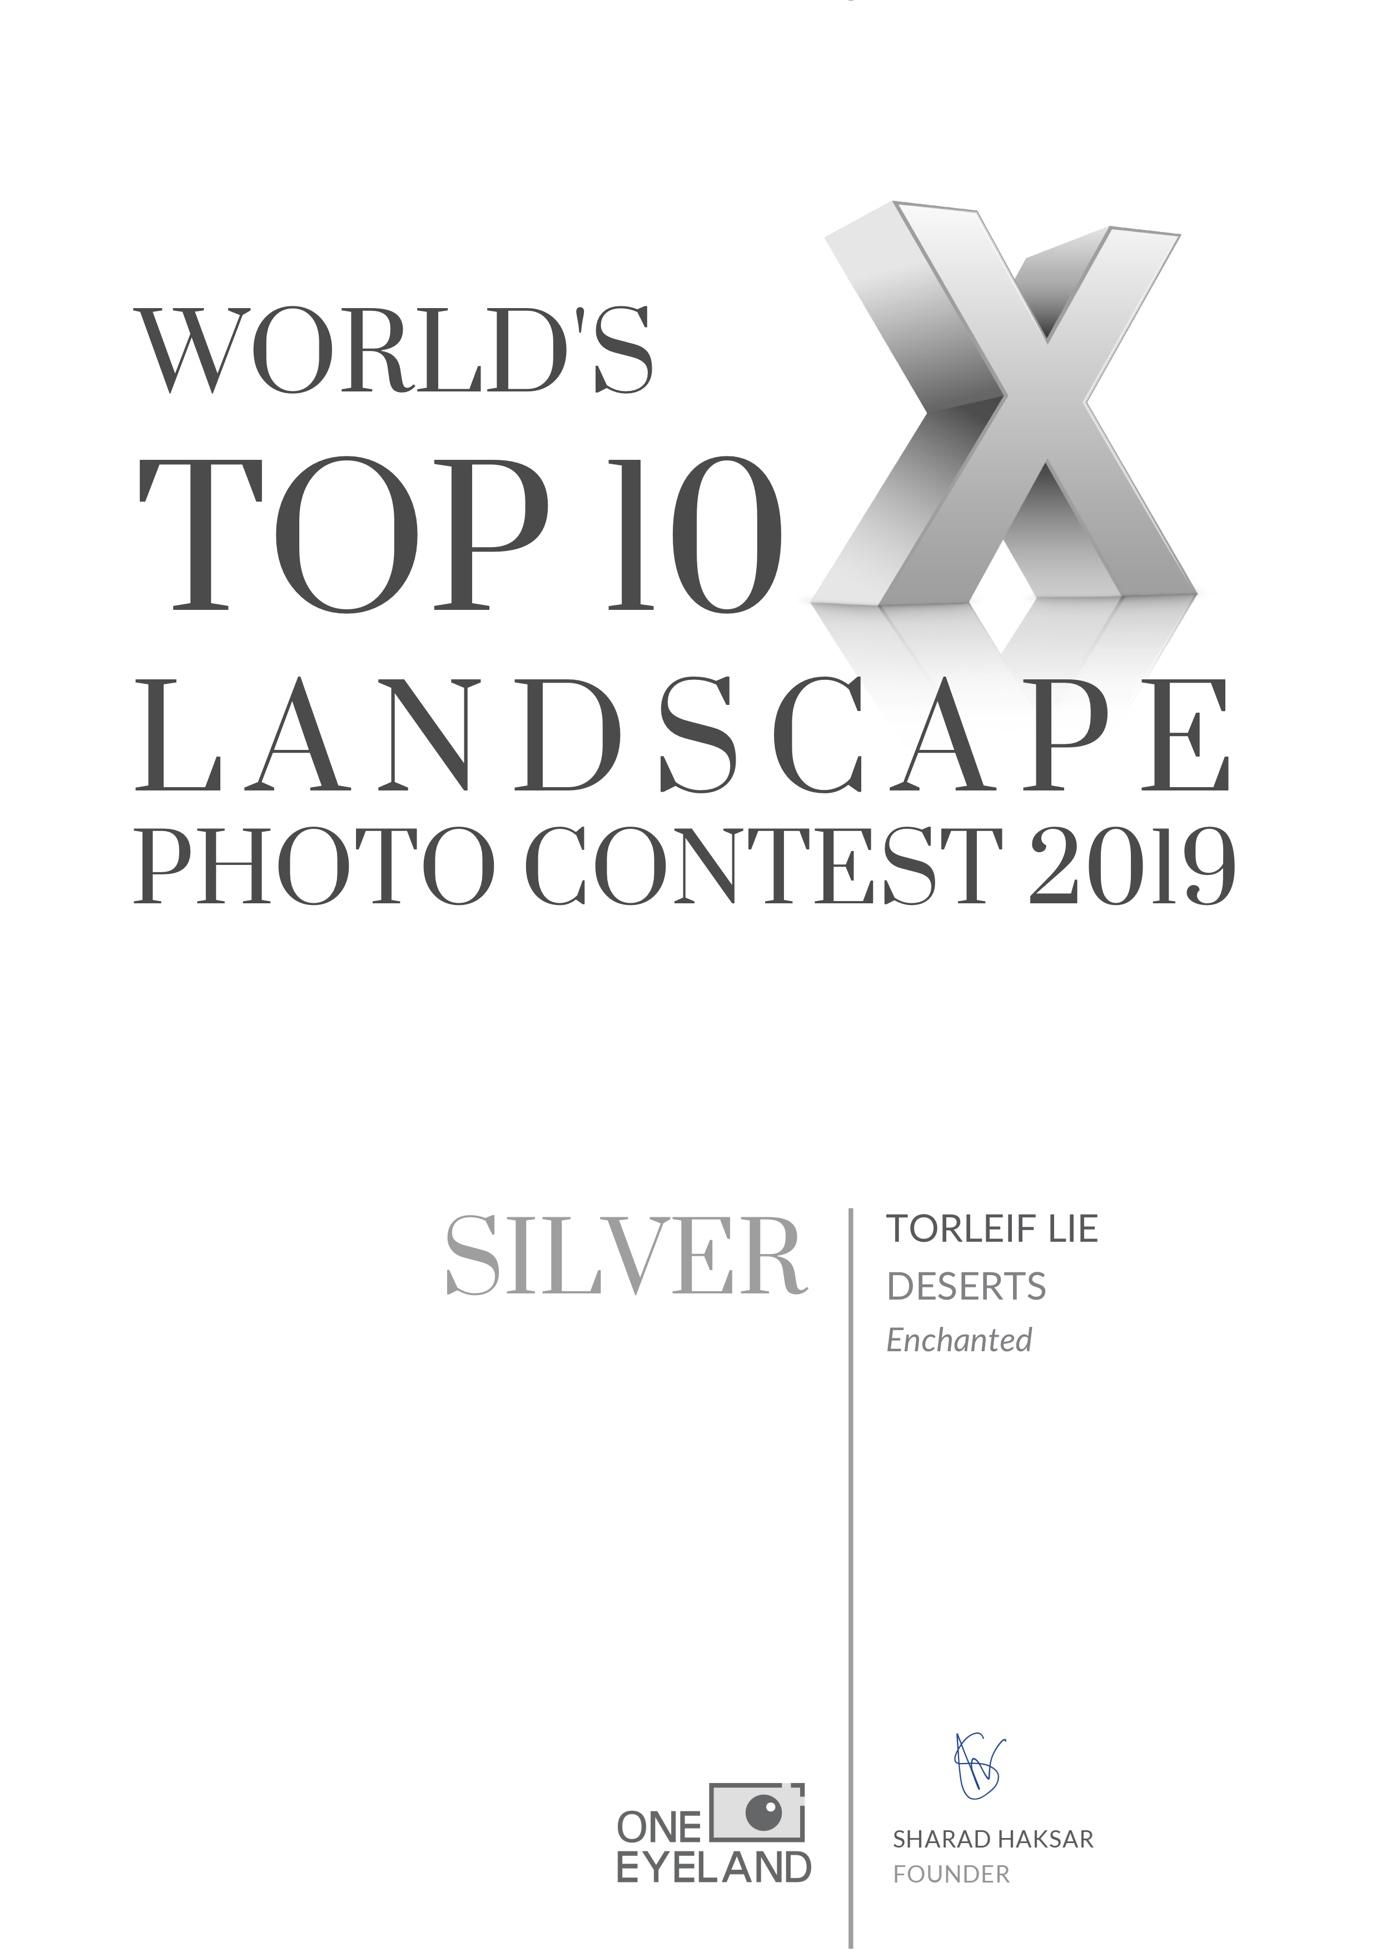 Enchanted-silver-landscape-deserts-2019